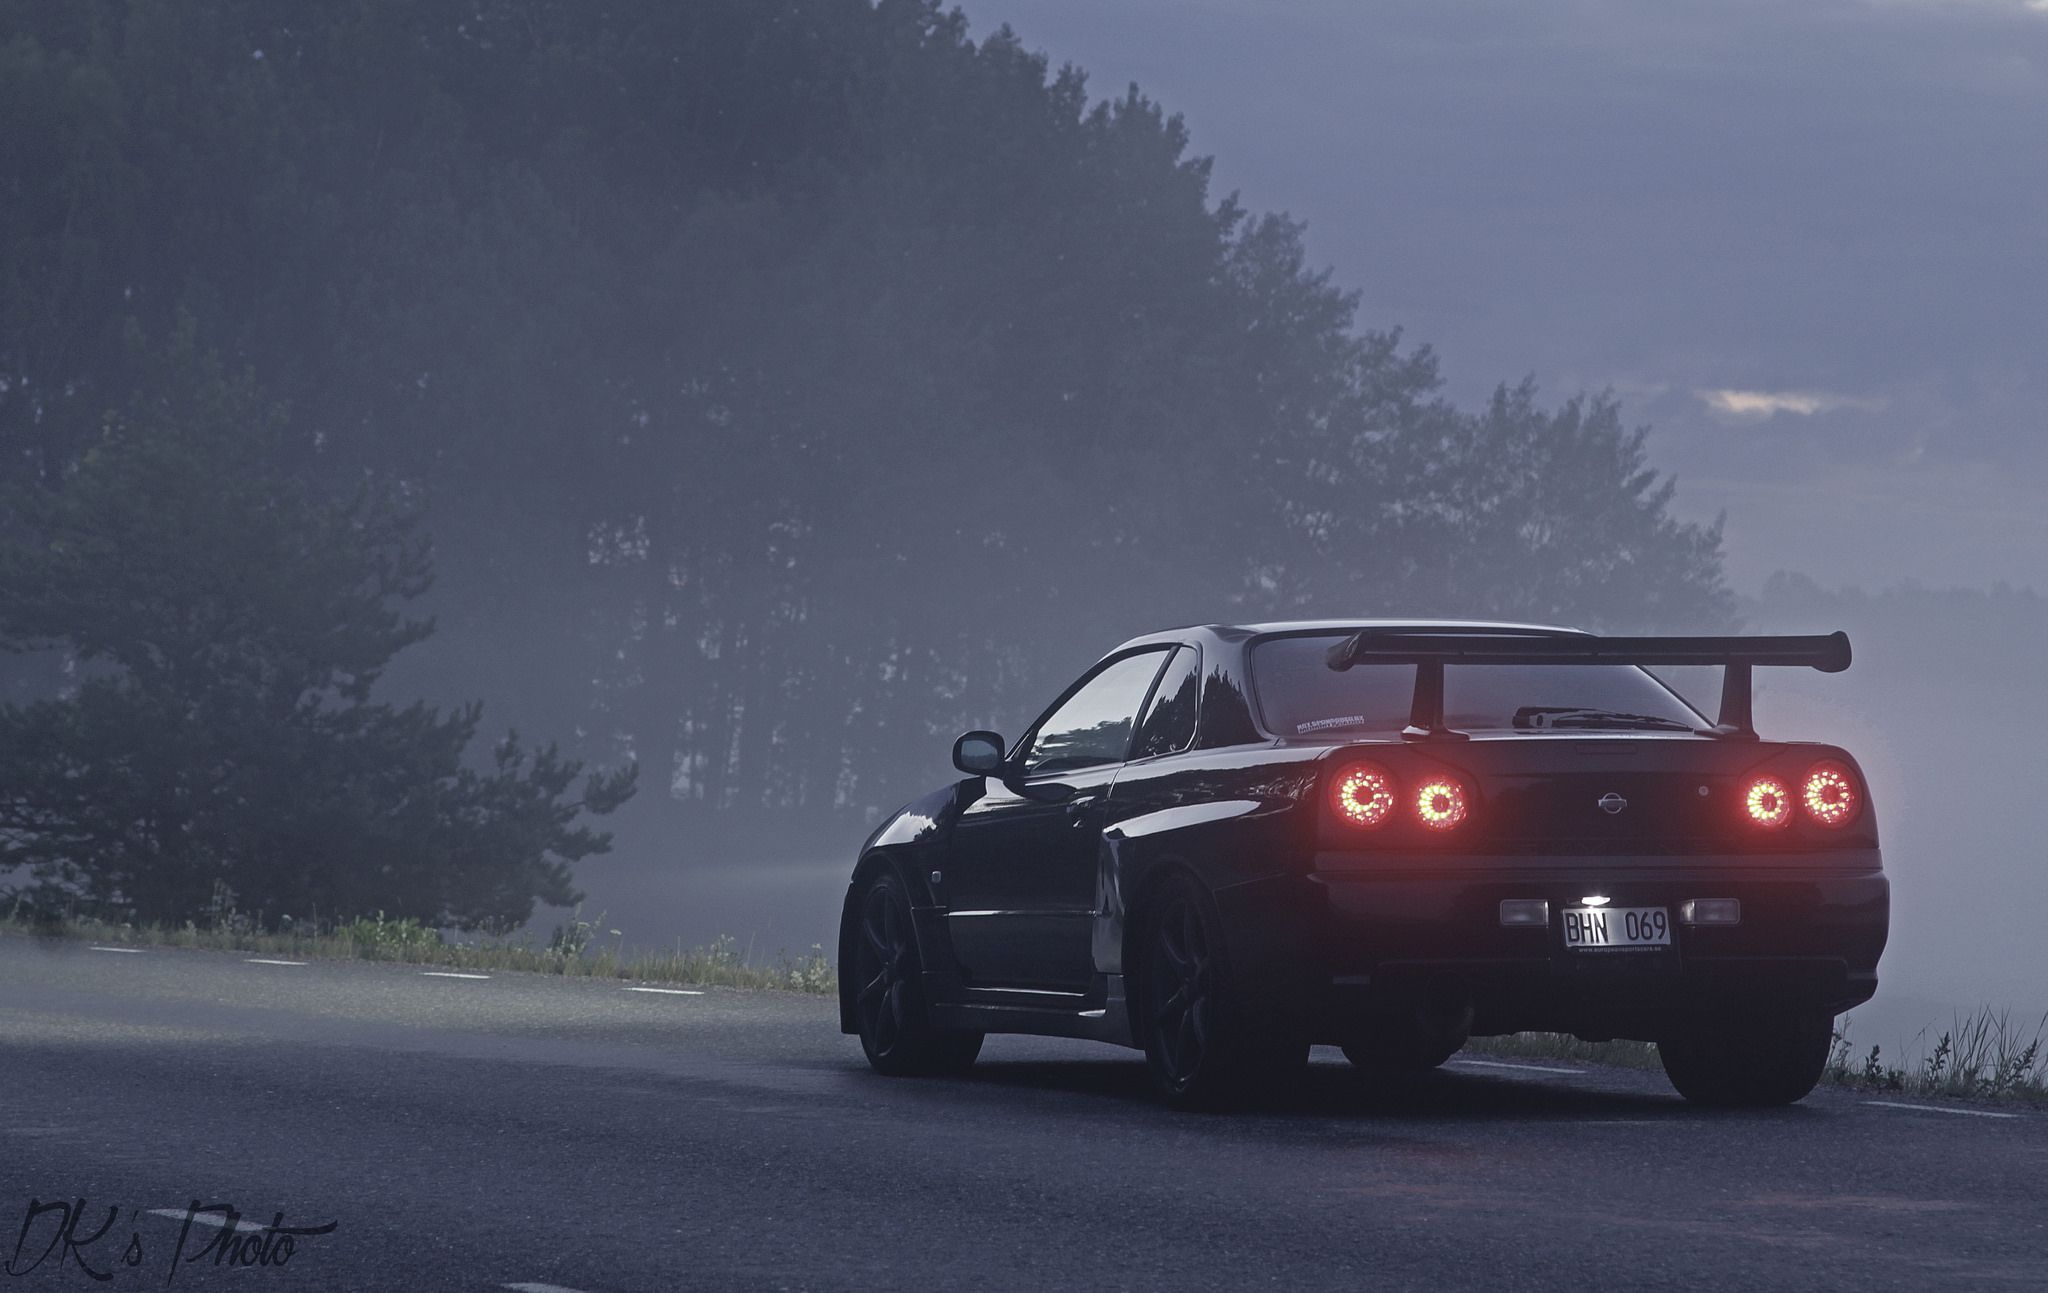 #Nissan #Skyline #R34 #JDM